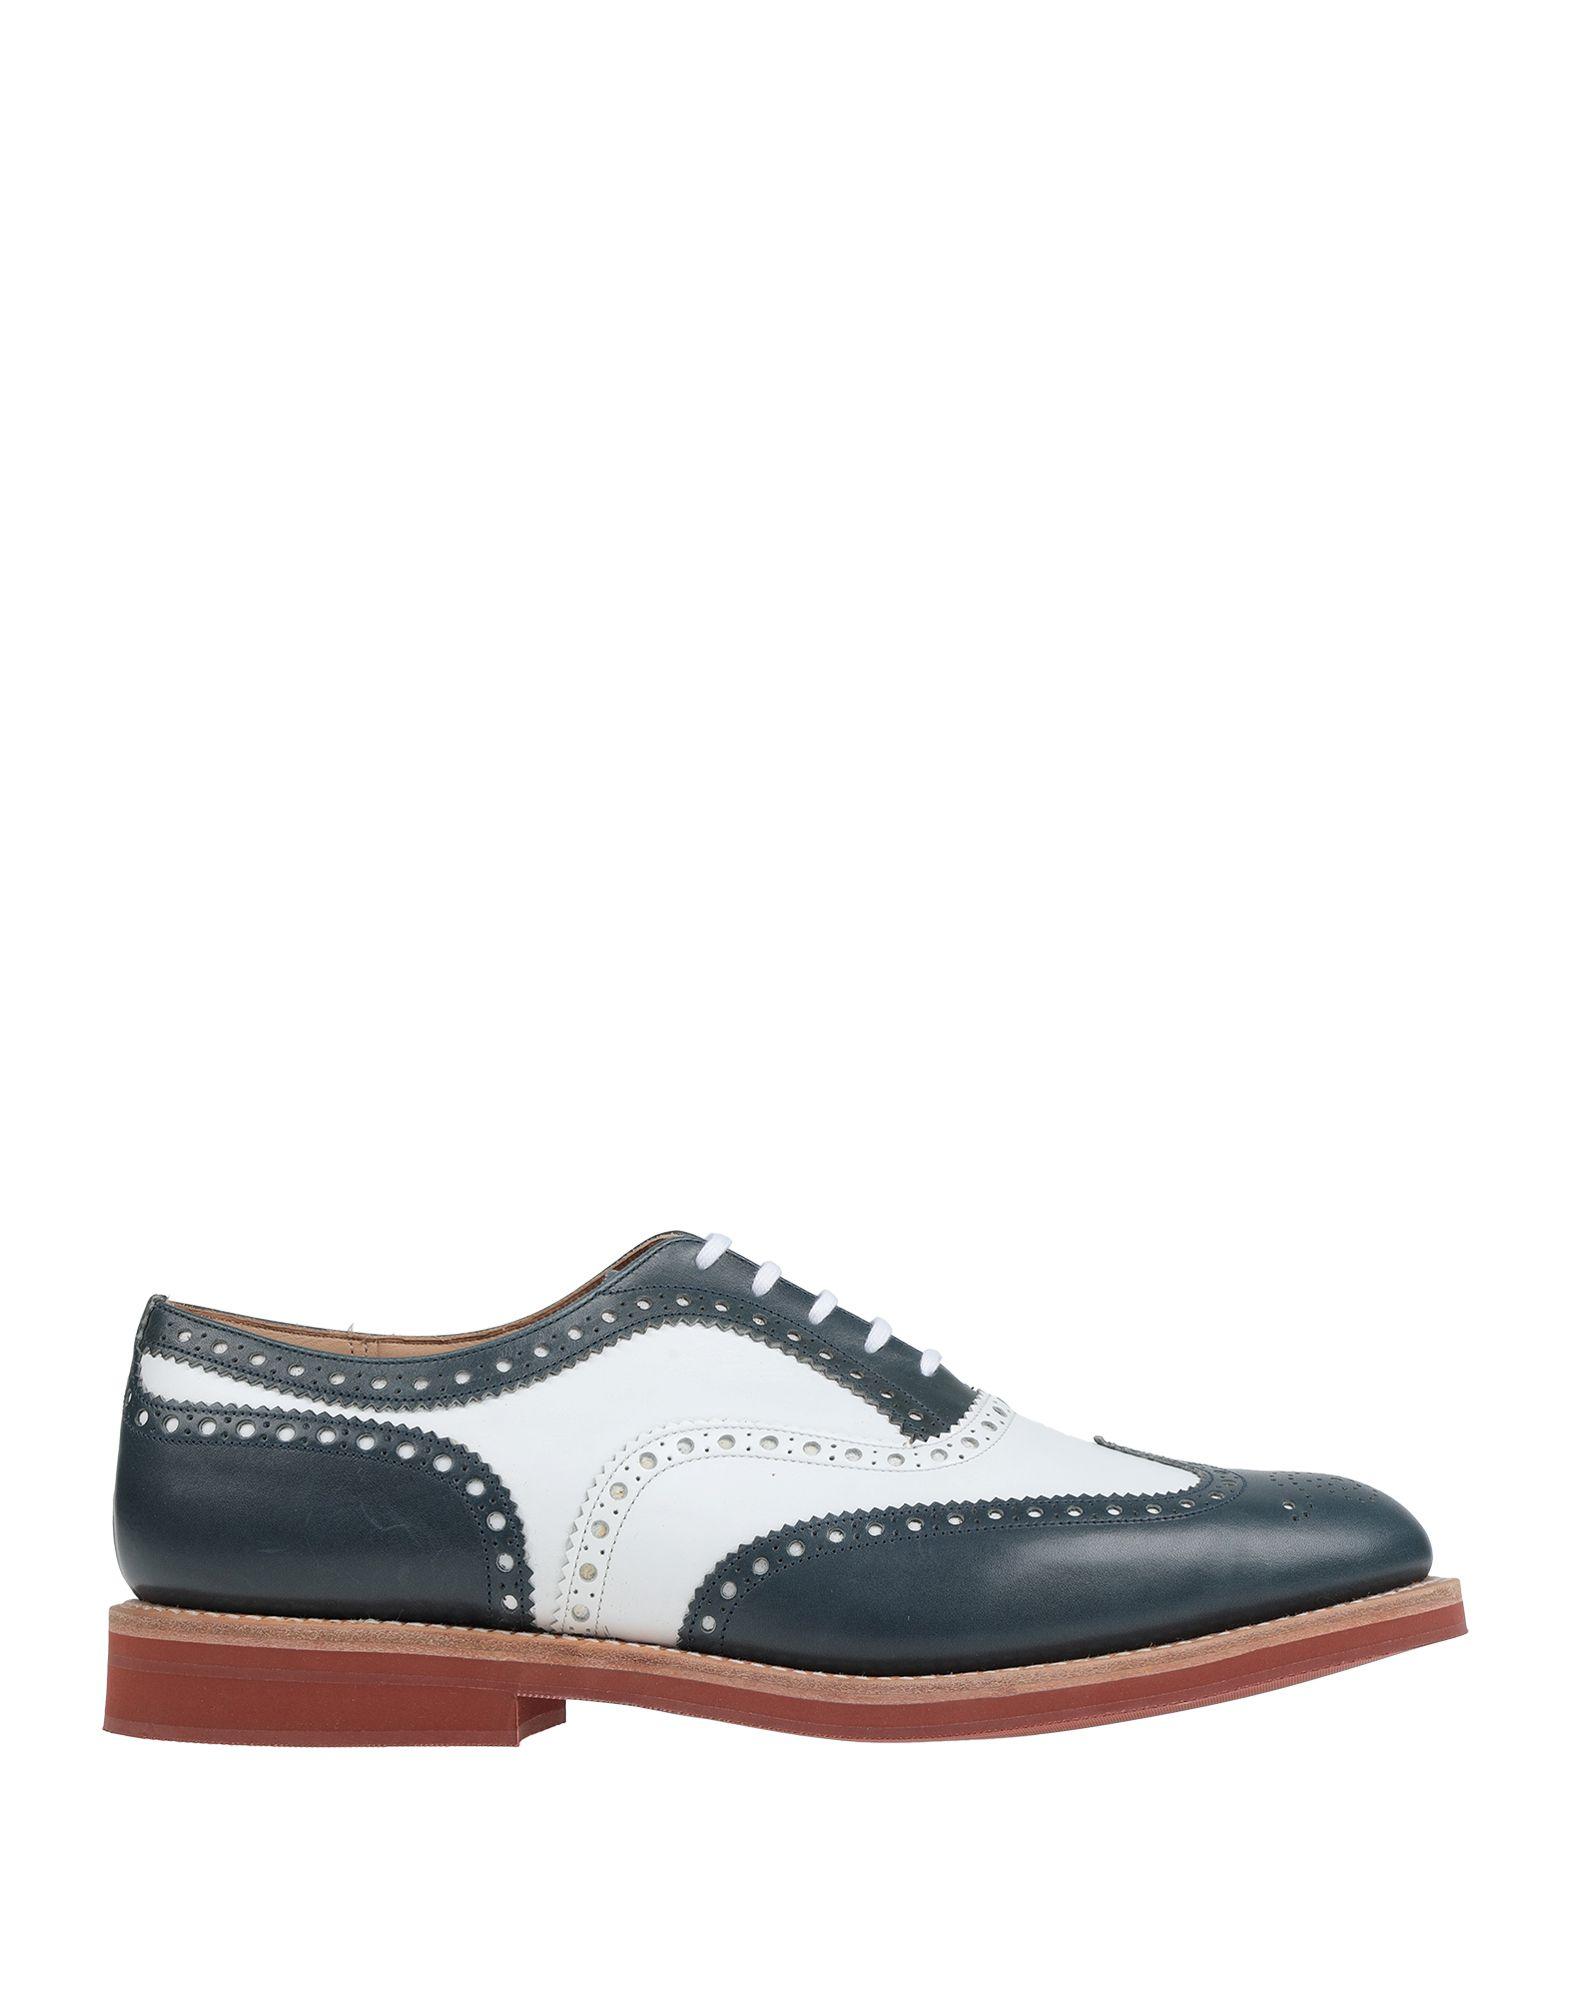 CHURCH'S Обувь на шнурках обувь ламода